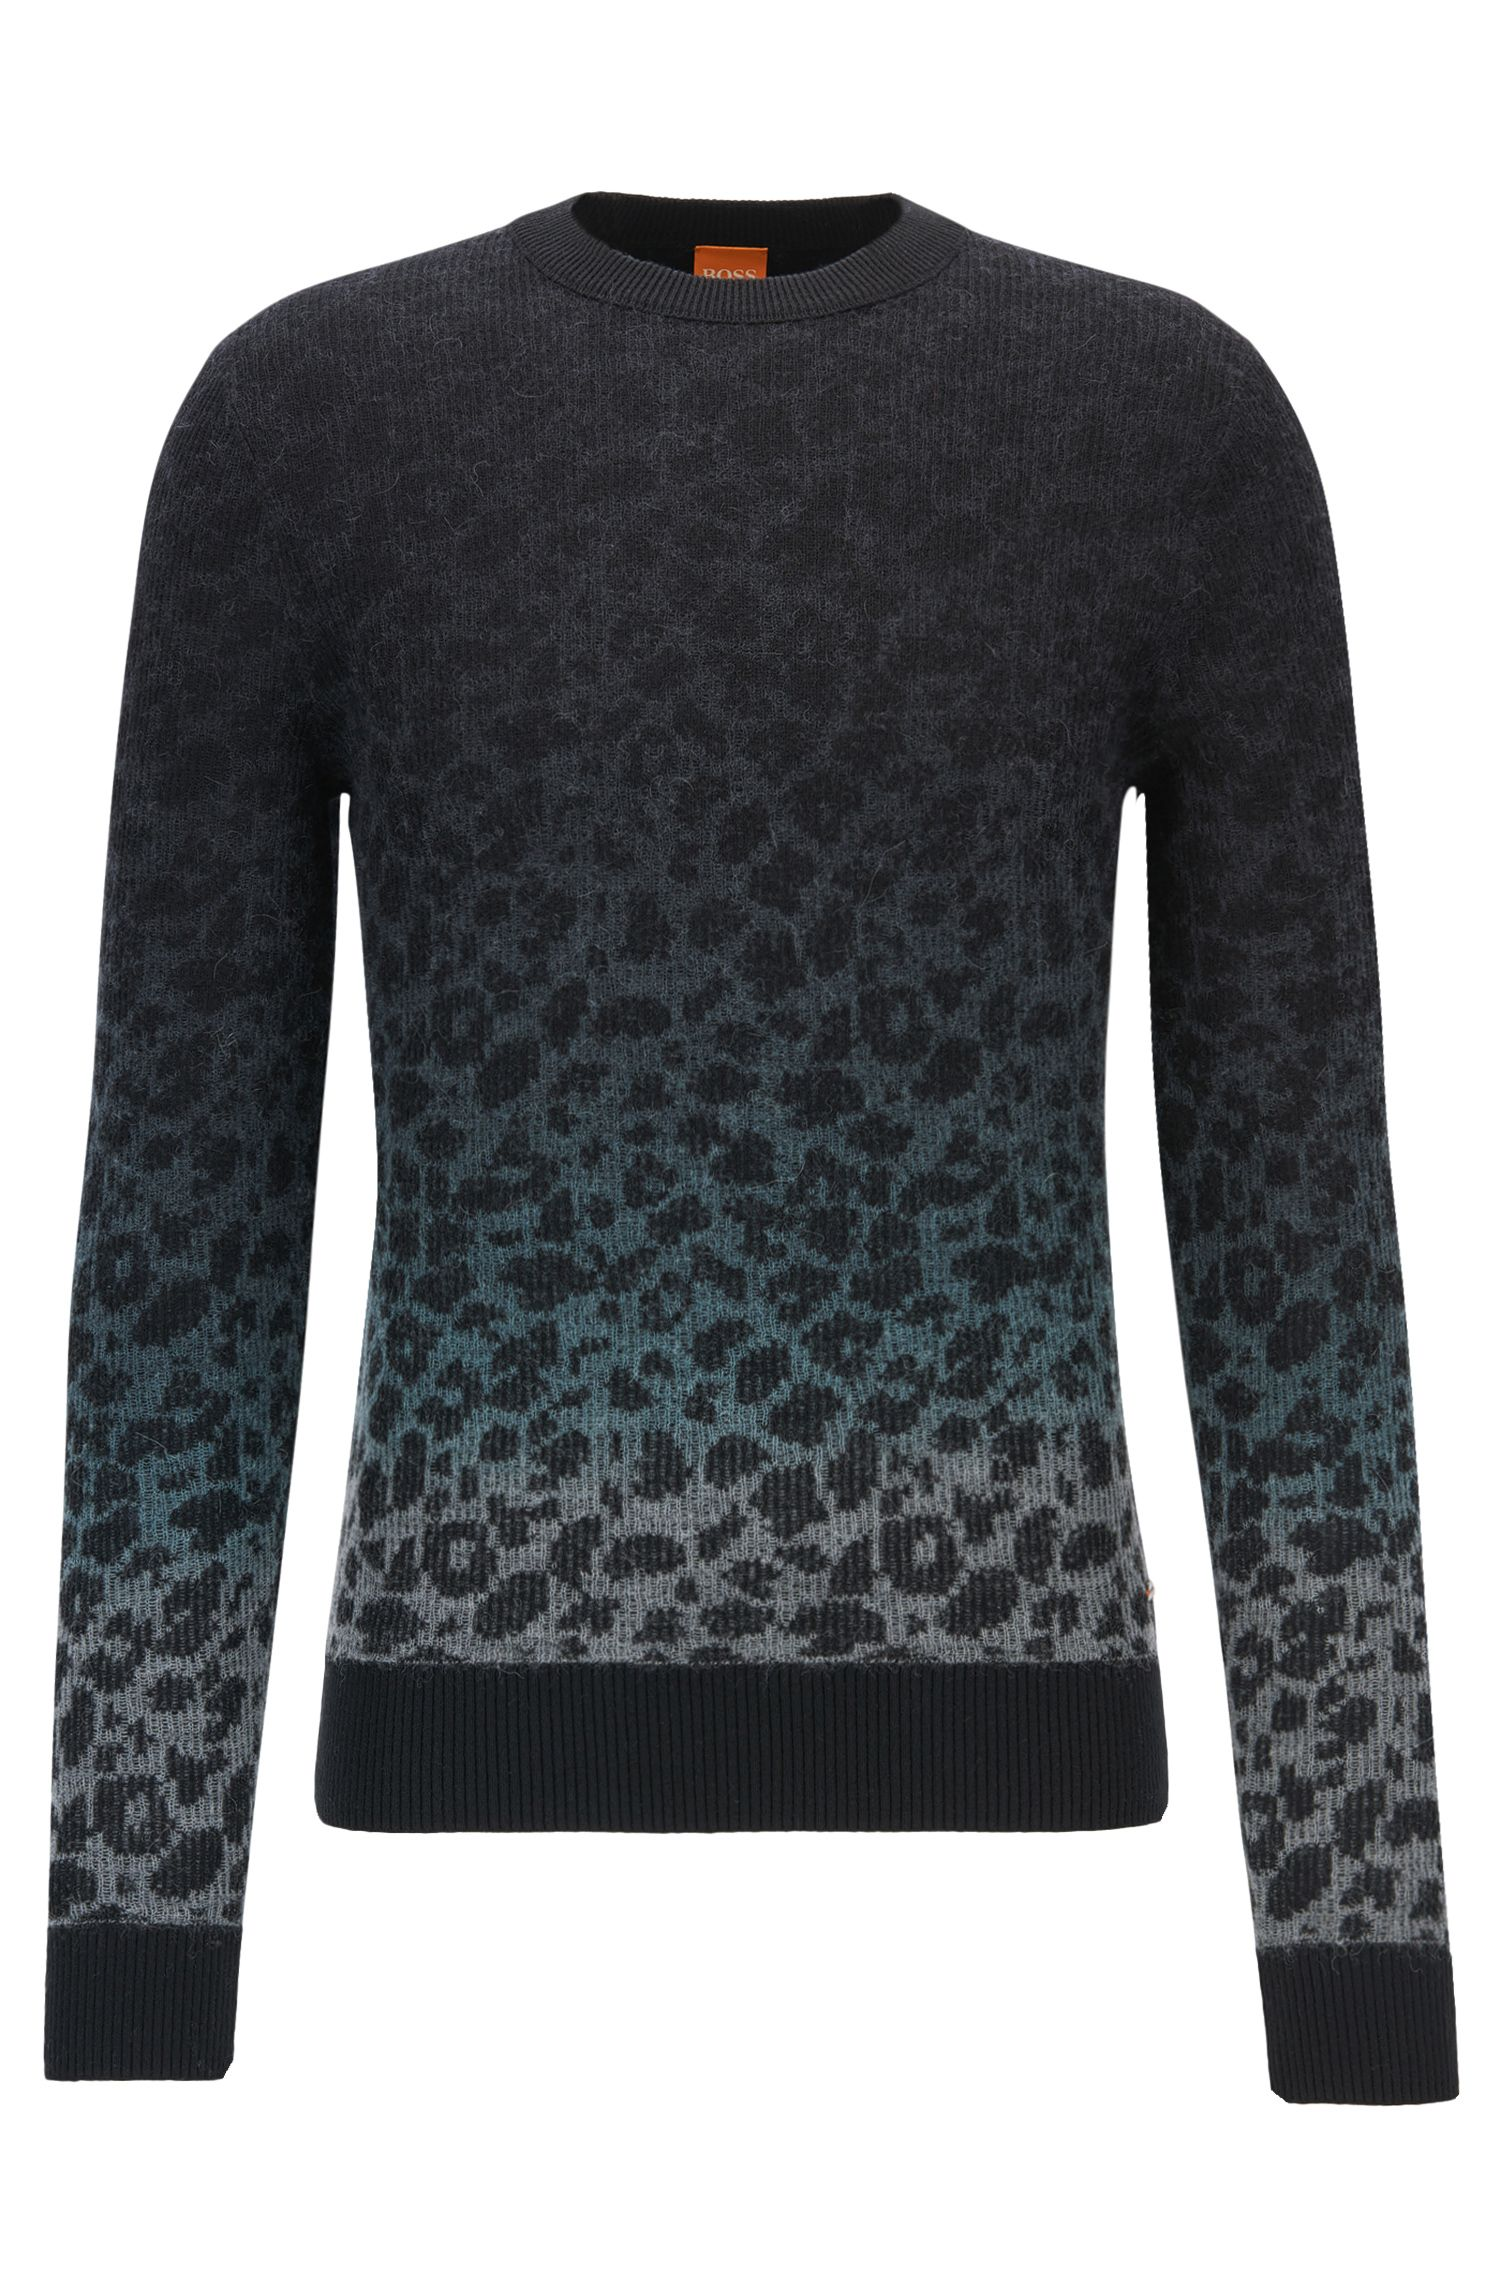 'Kapard' | Regular Fit, Leopard-Print Stretch Cotton Blend Sweater, Light Grey